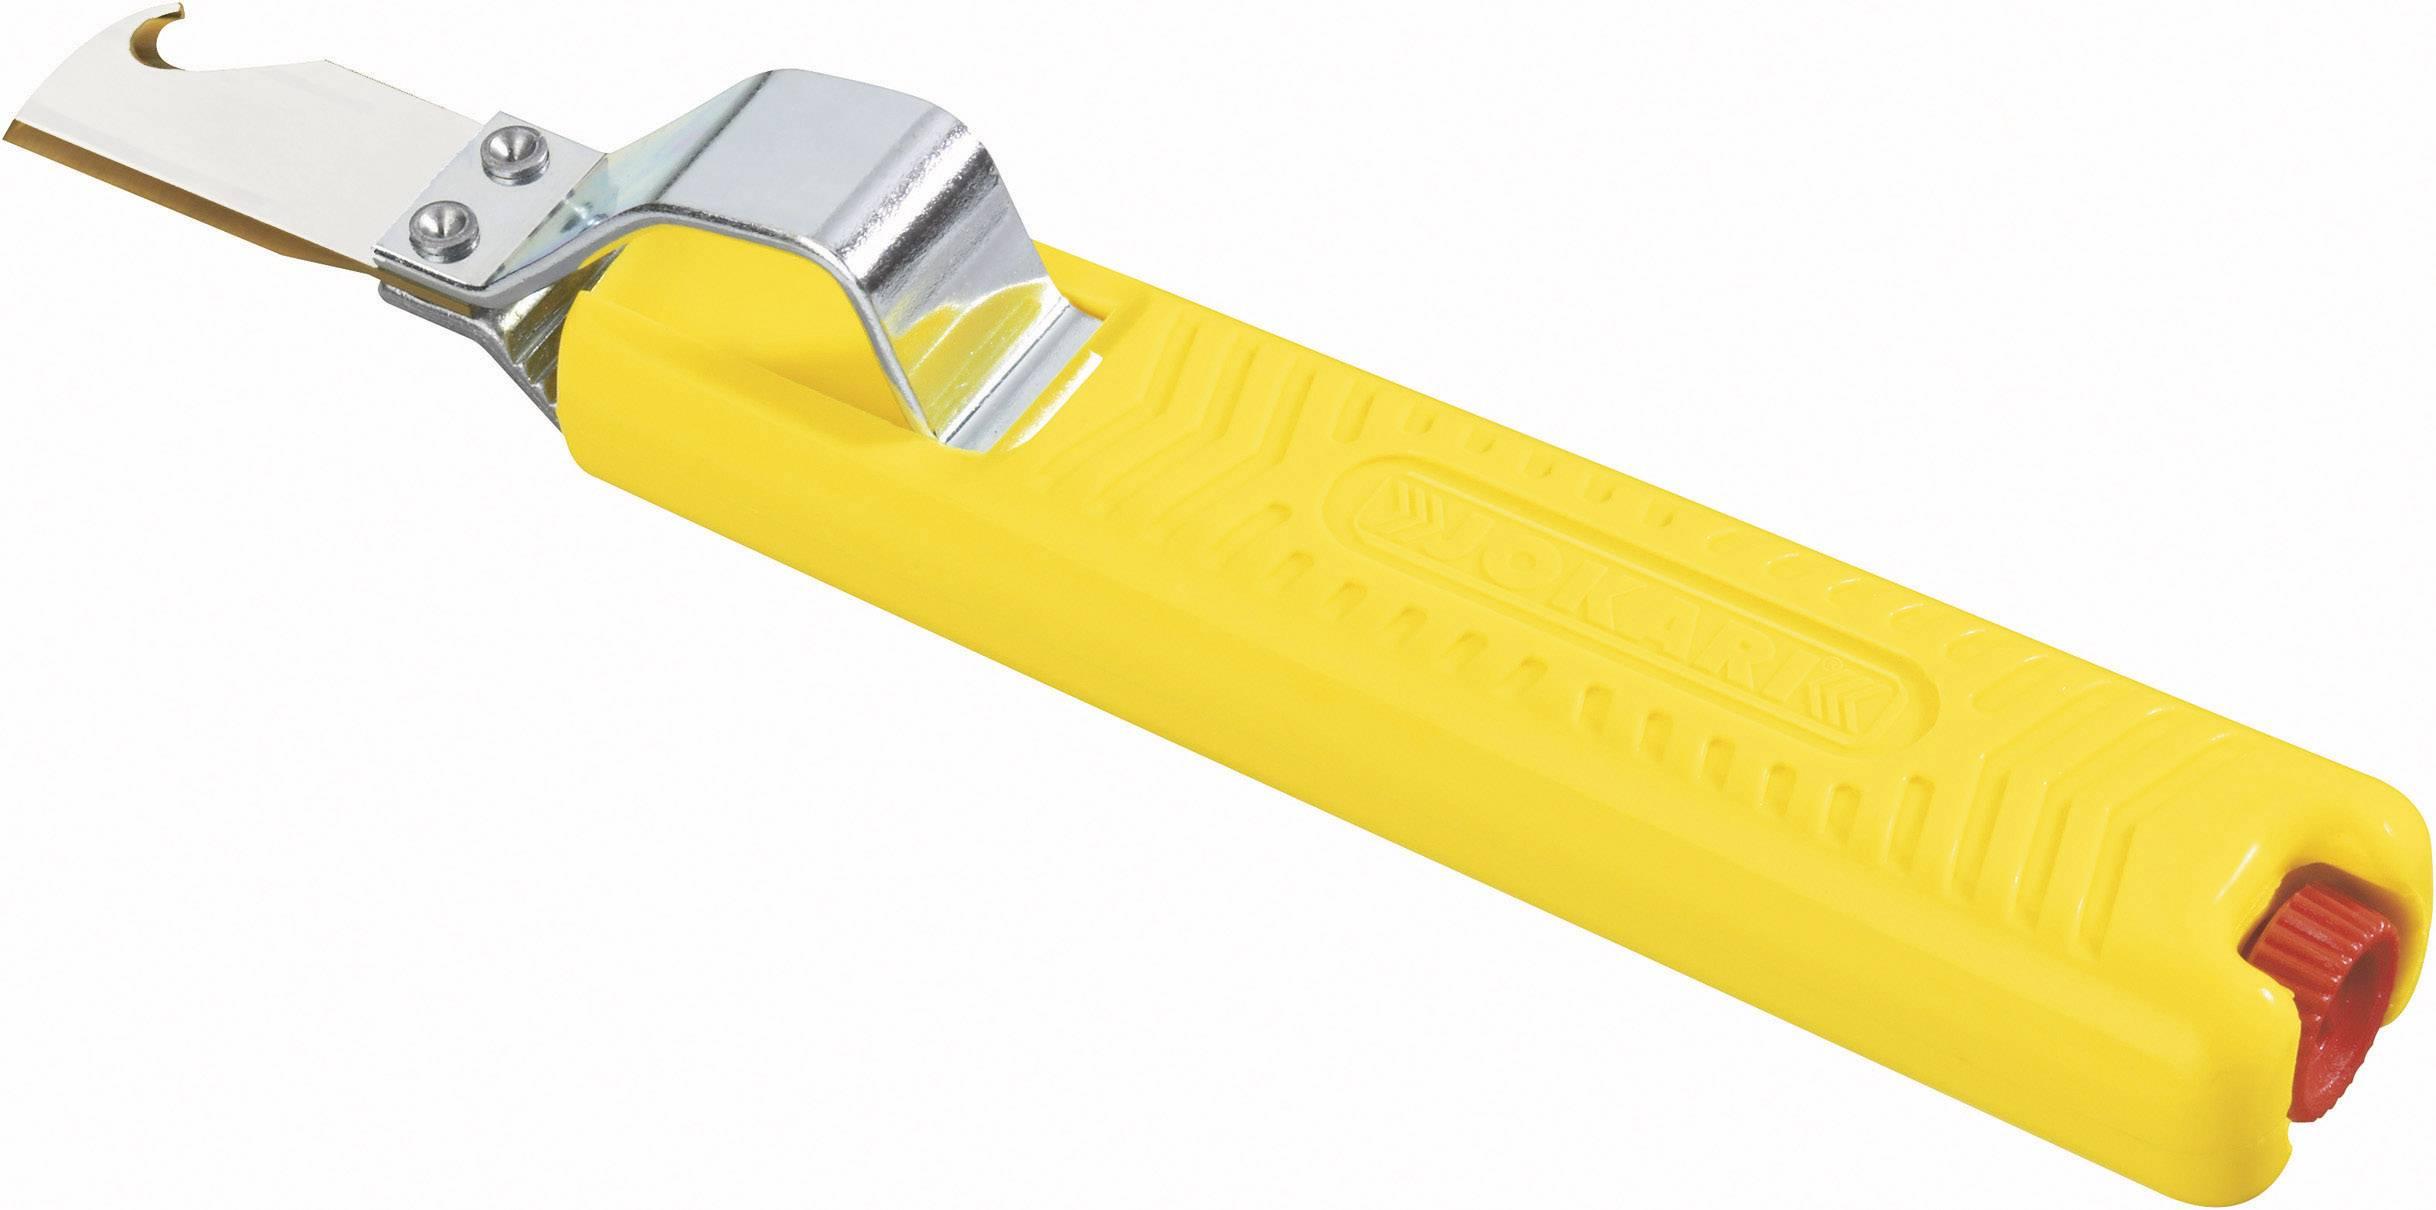 Nůž na kabely s hákem Jokari No. 28 H Standard, Ø 8 - 28 mm